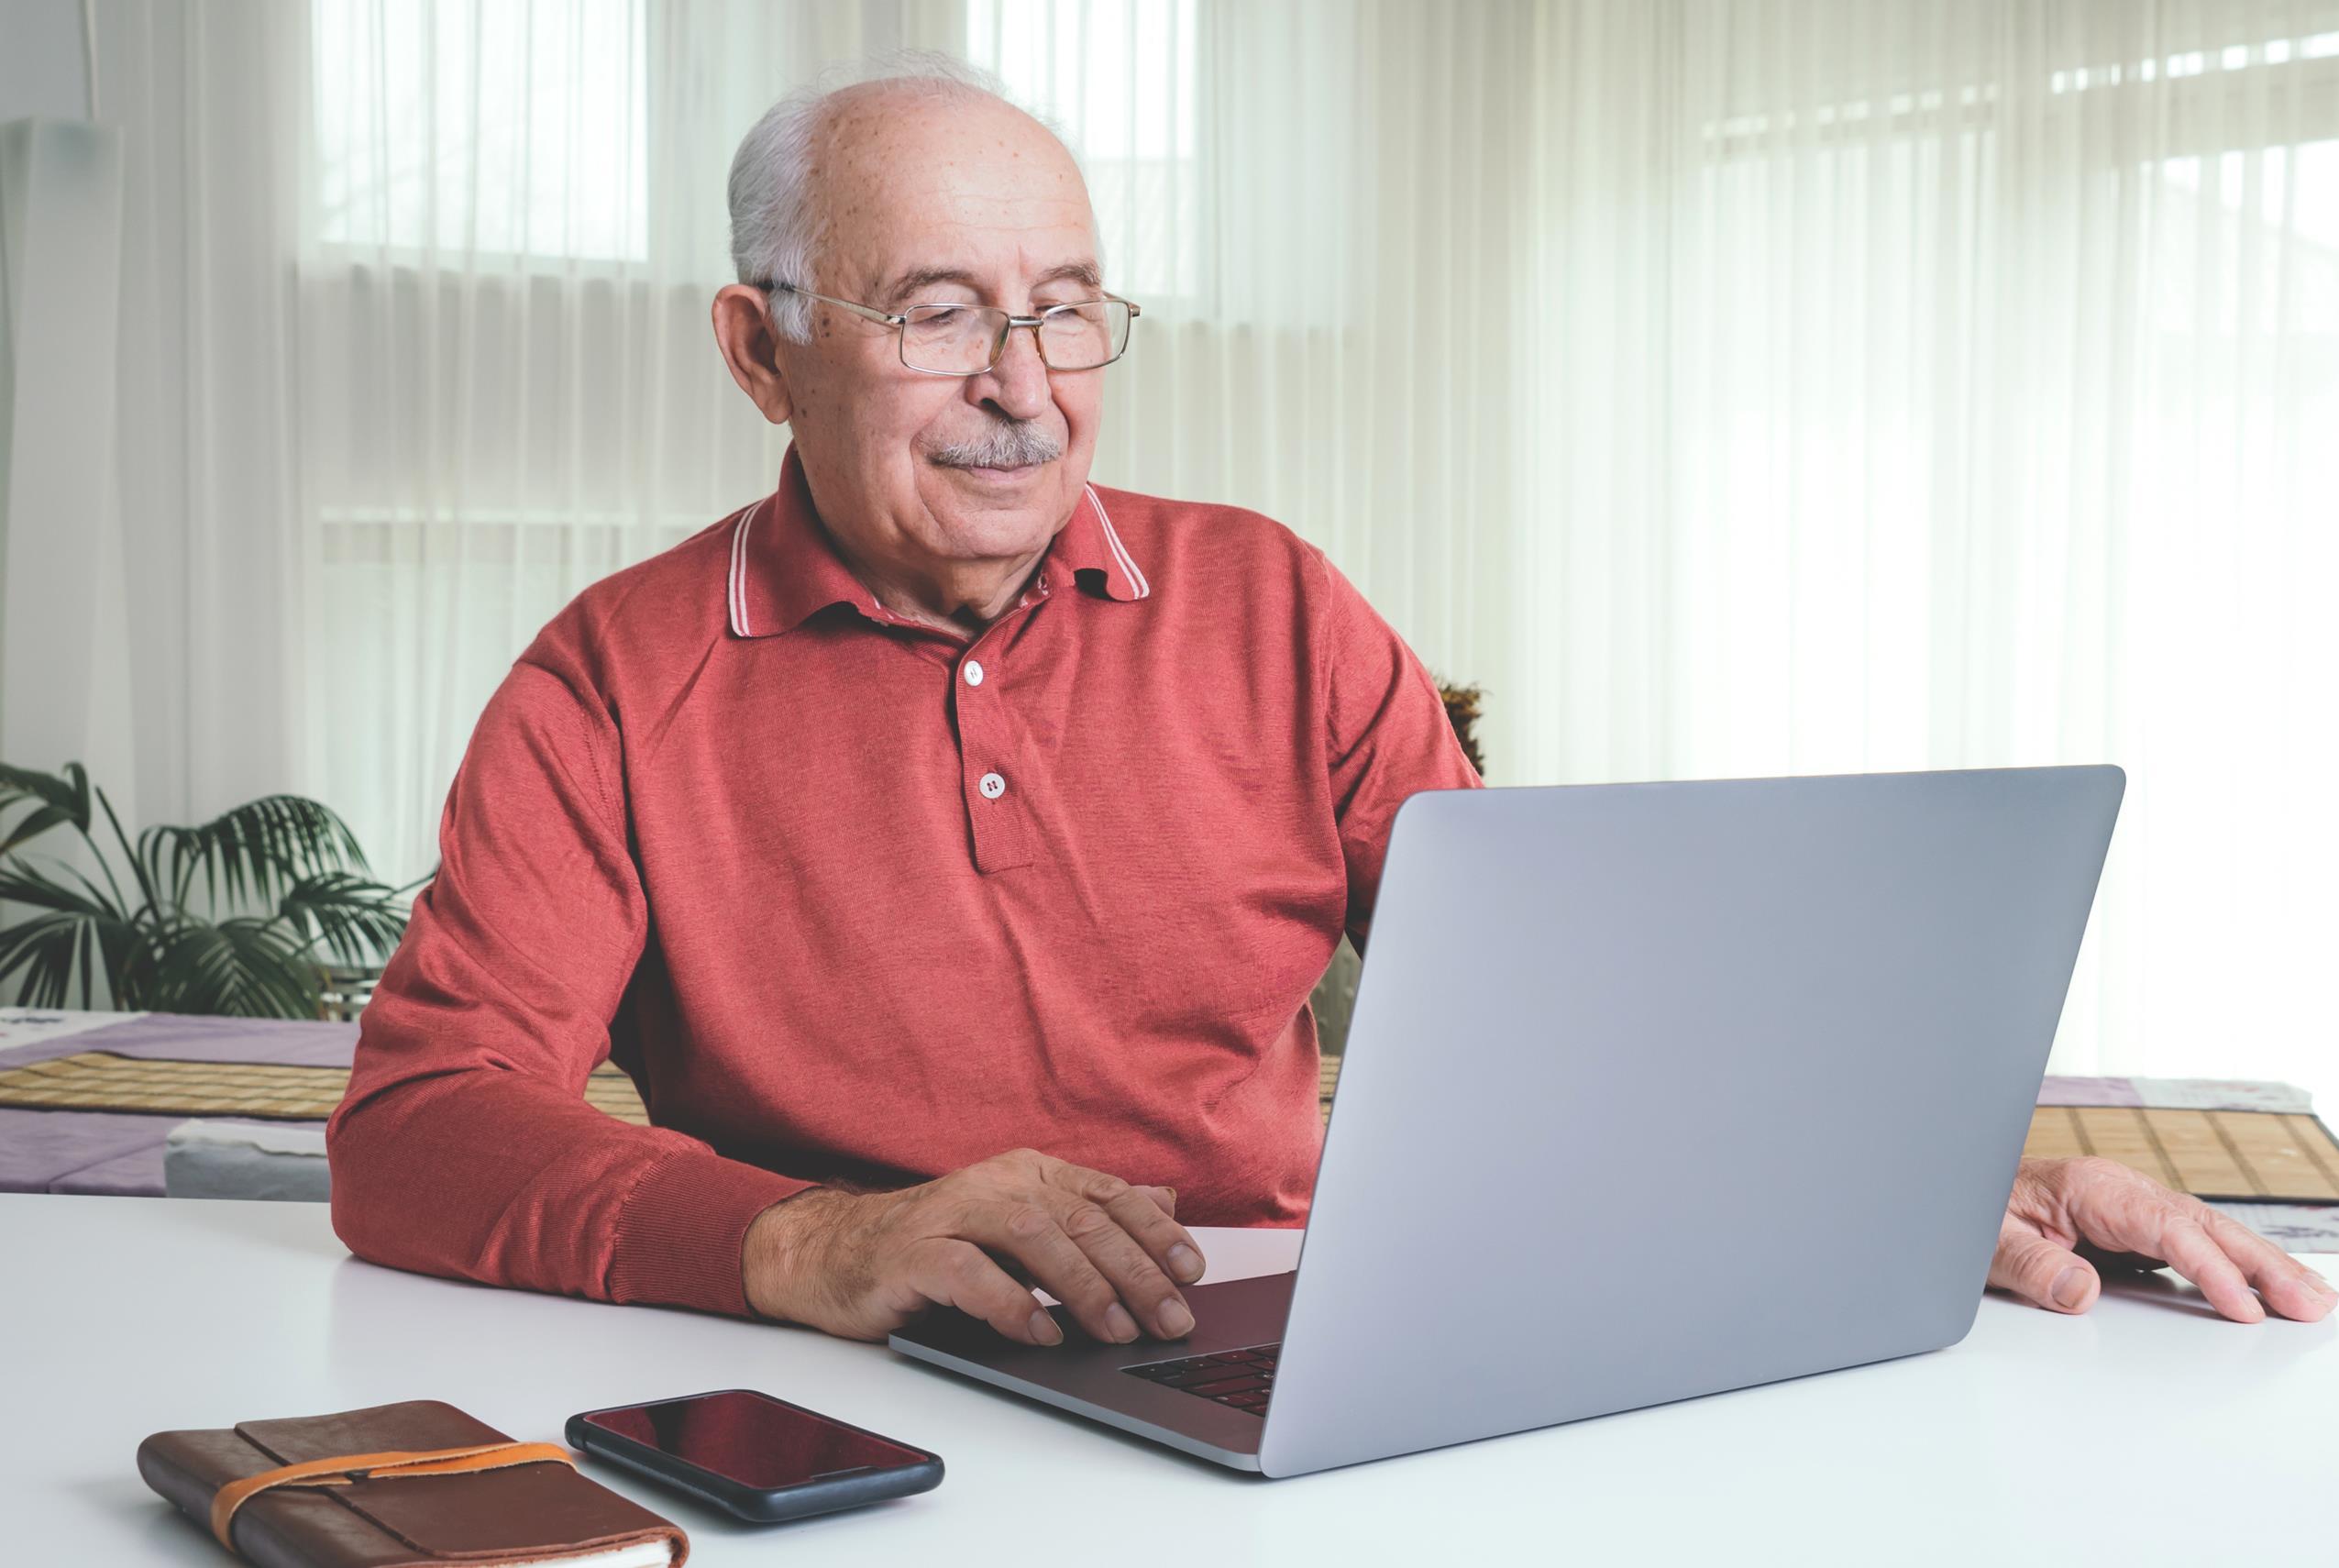 man using computer for telemedicine